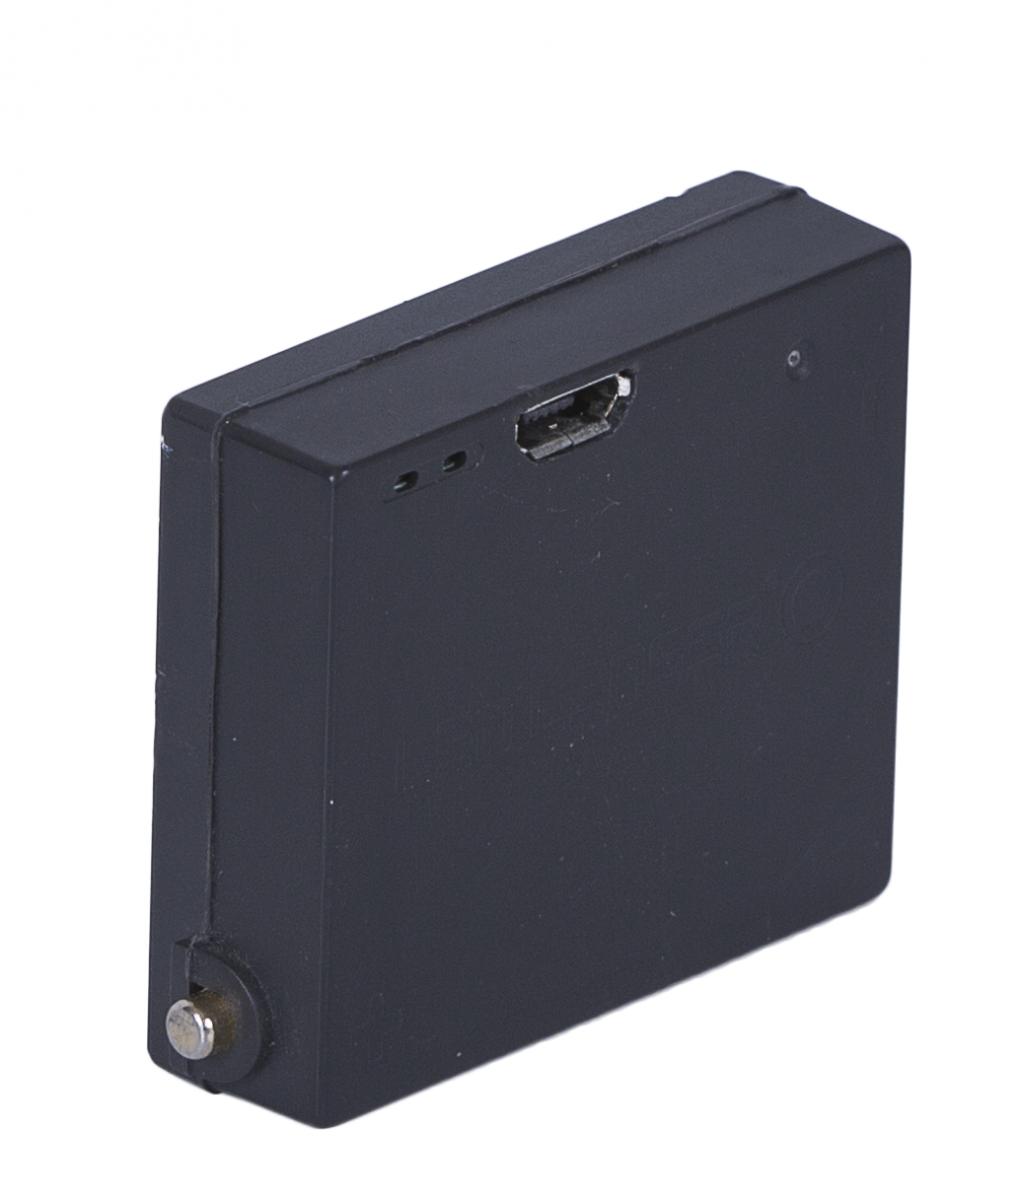 /produkty/191/celove-svietidla/Led-Lenser/Nahradny-akumulator-pre-Led-Lenser-SEO-MH2-a-MH6